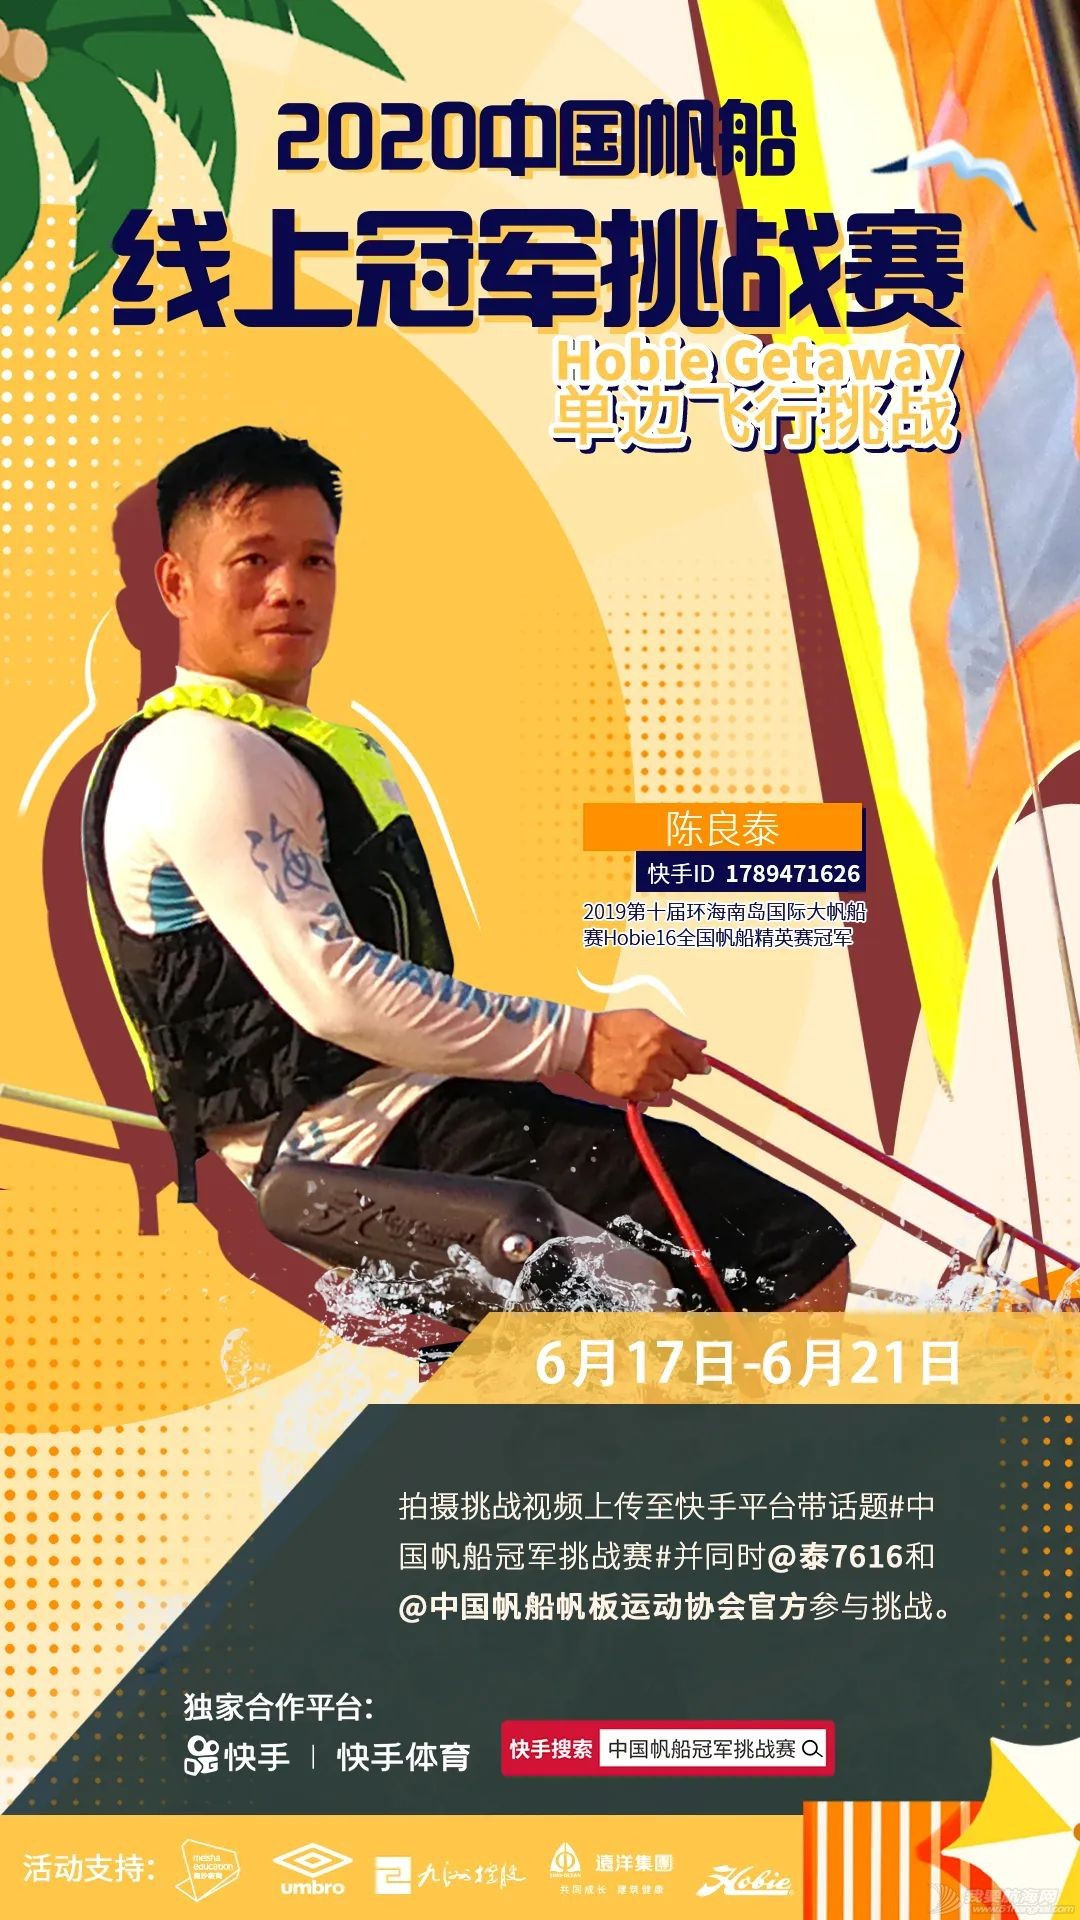 Battle海上飞行员,好胆你就来!中国帆船线上冠军挑战赛第二期Hobie Getaway单边飞行挑战上线!w2.jpg